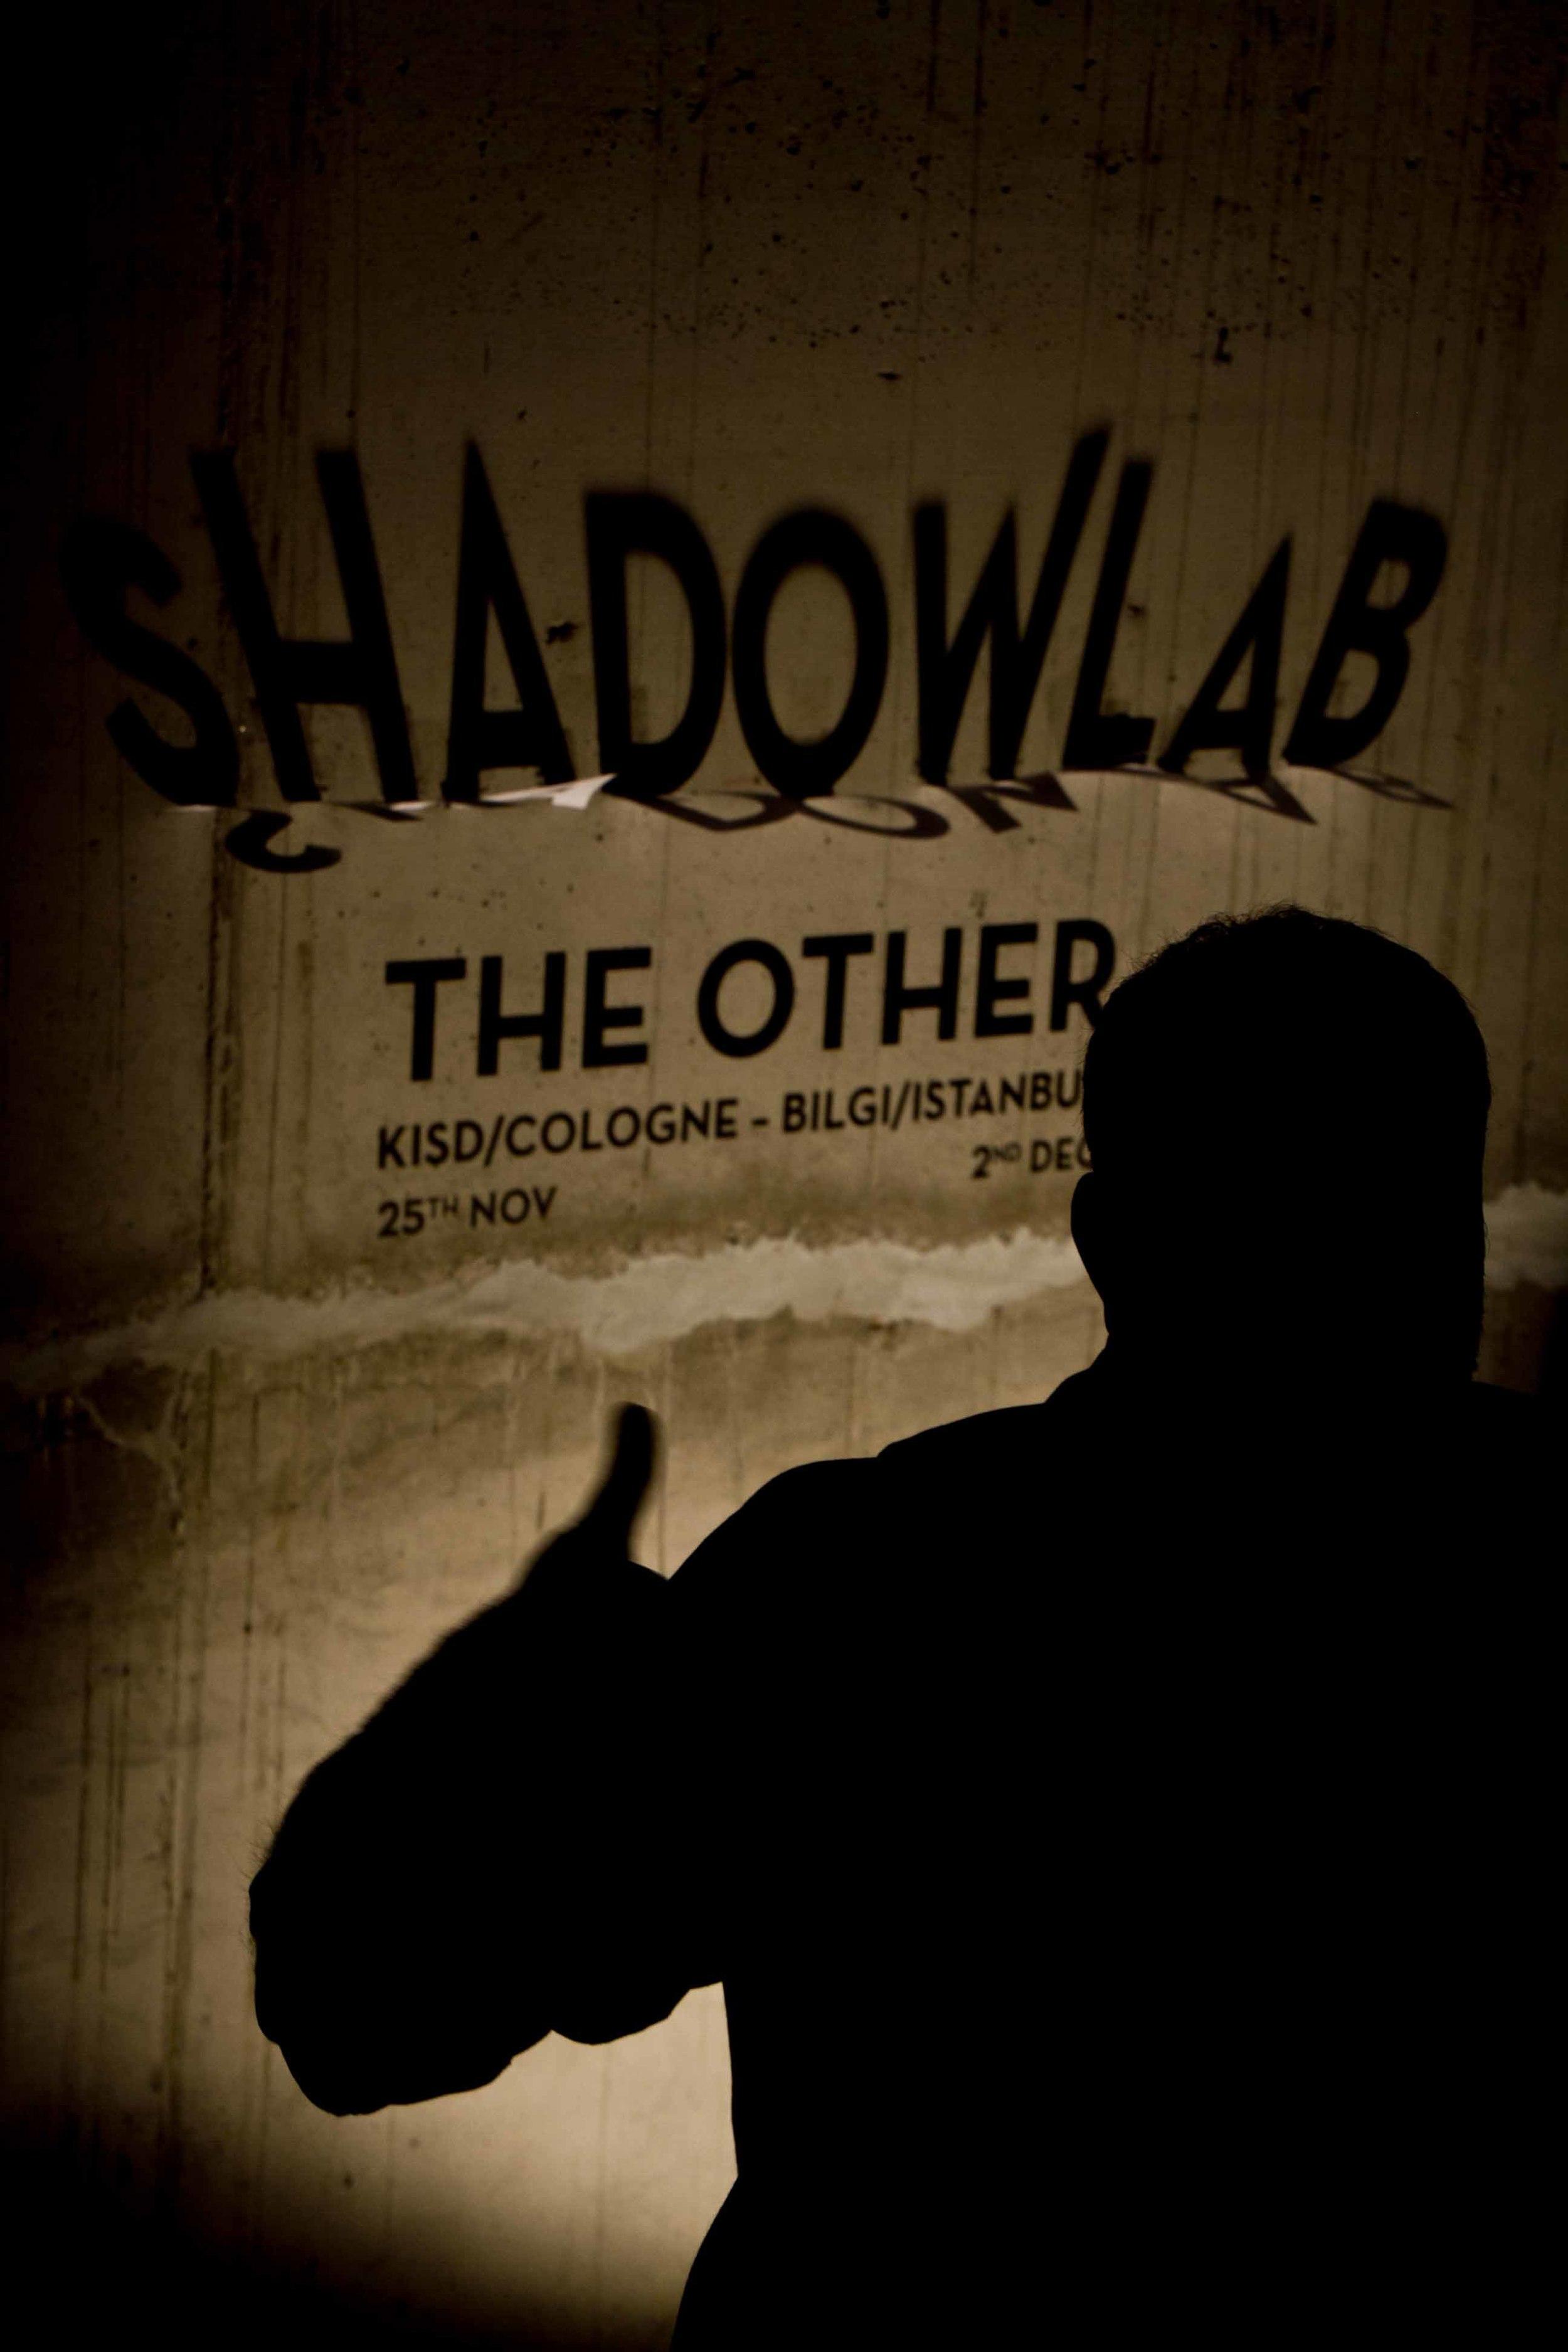 shadowlab_6.jpg